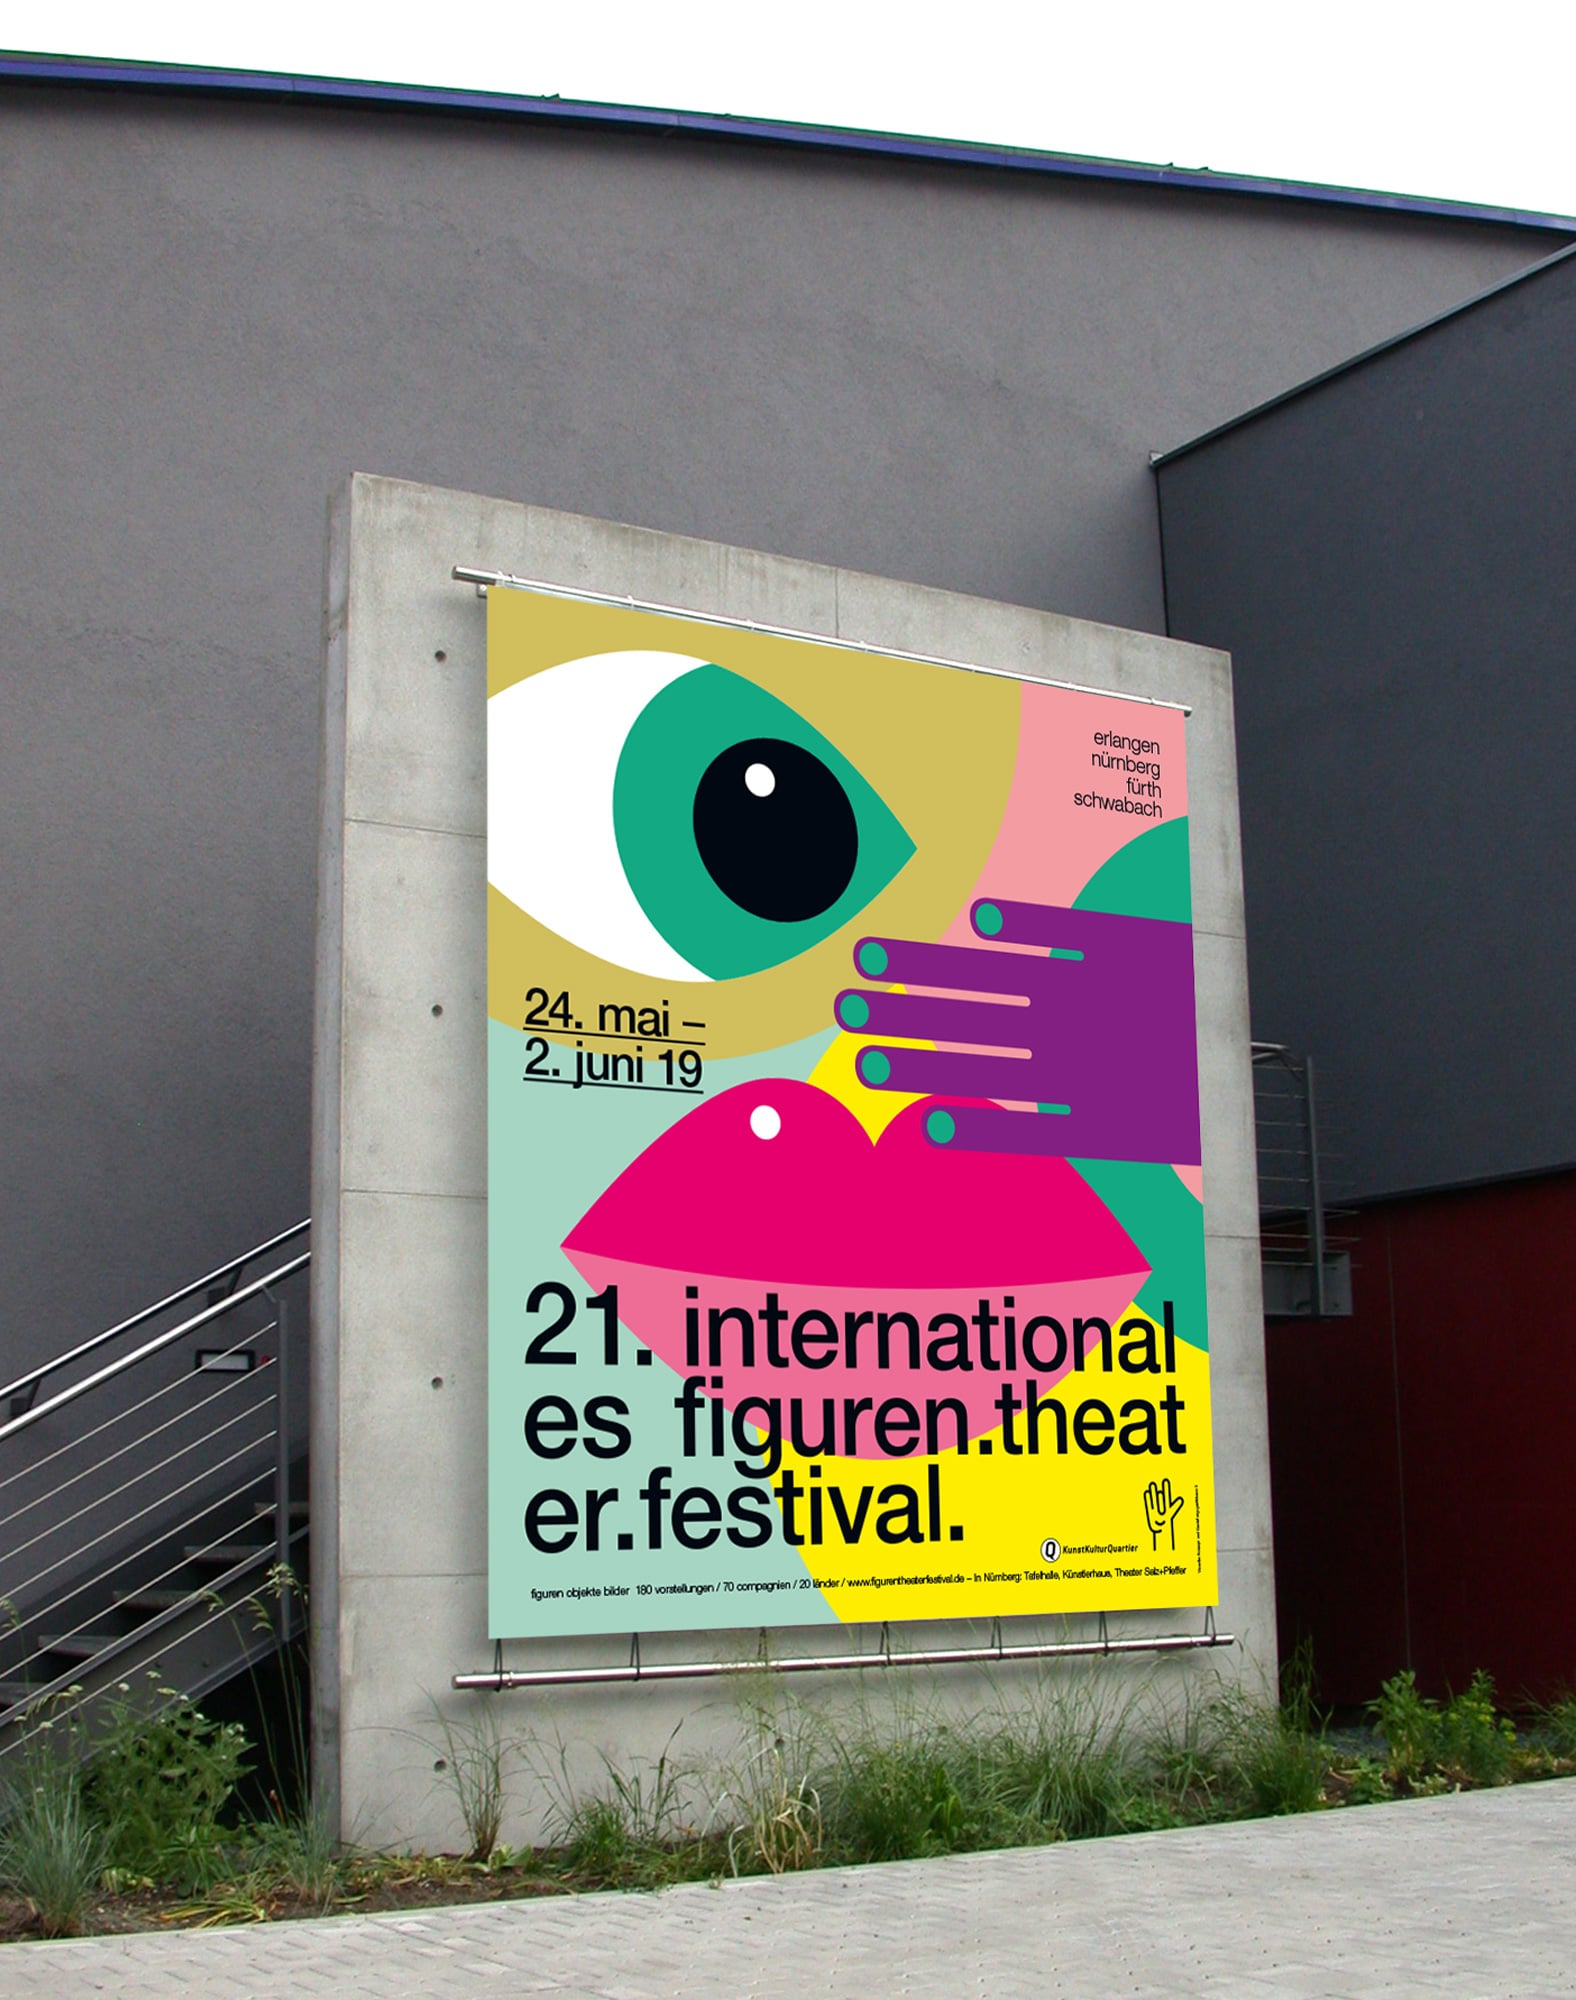 planx-internationales.figuren.theater.festival-Betonbanner1